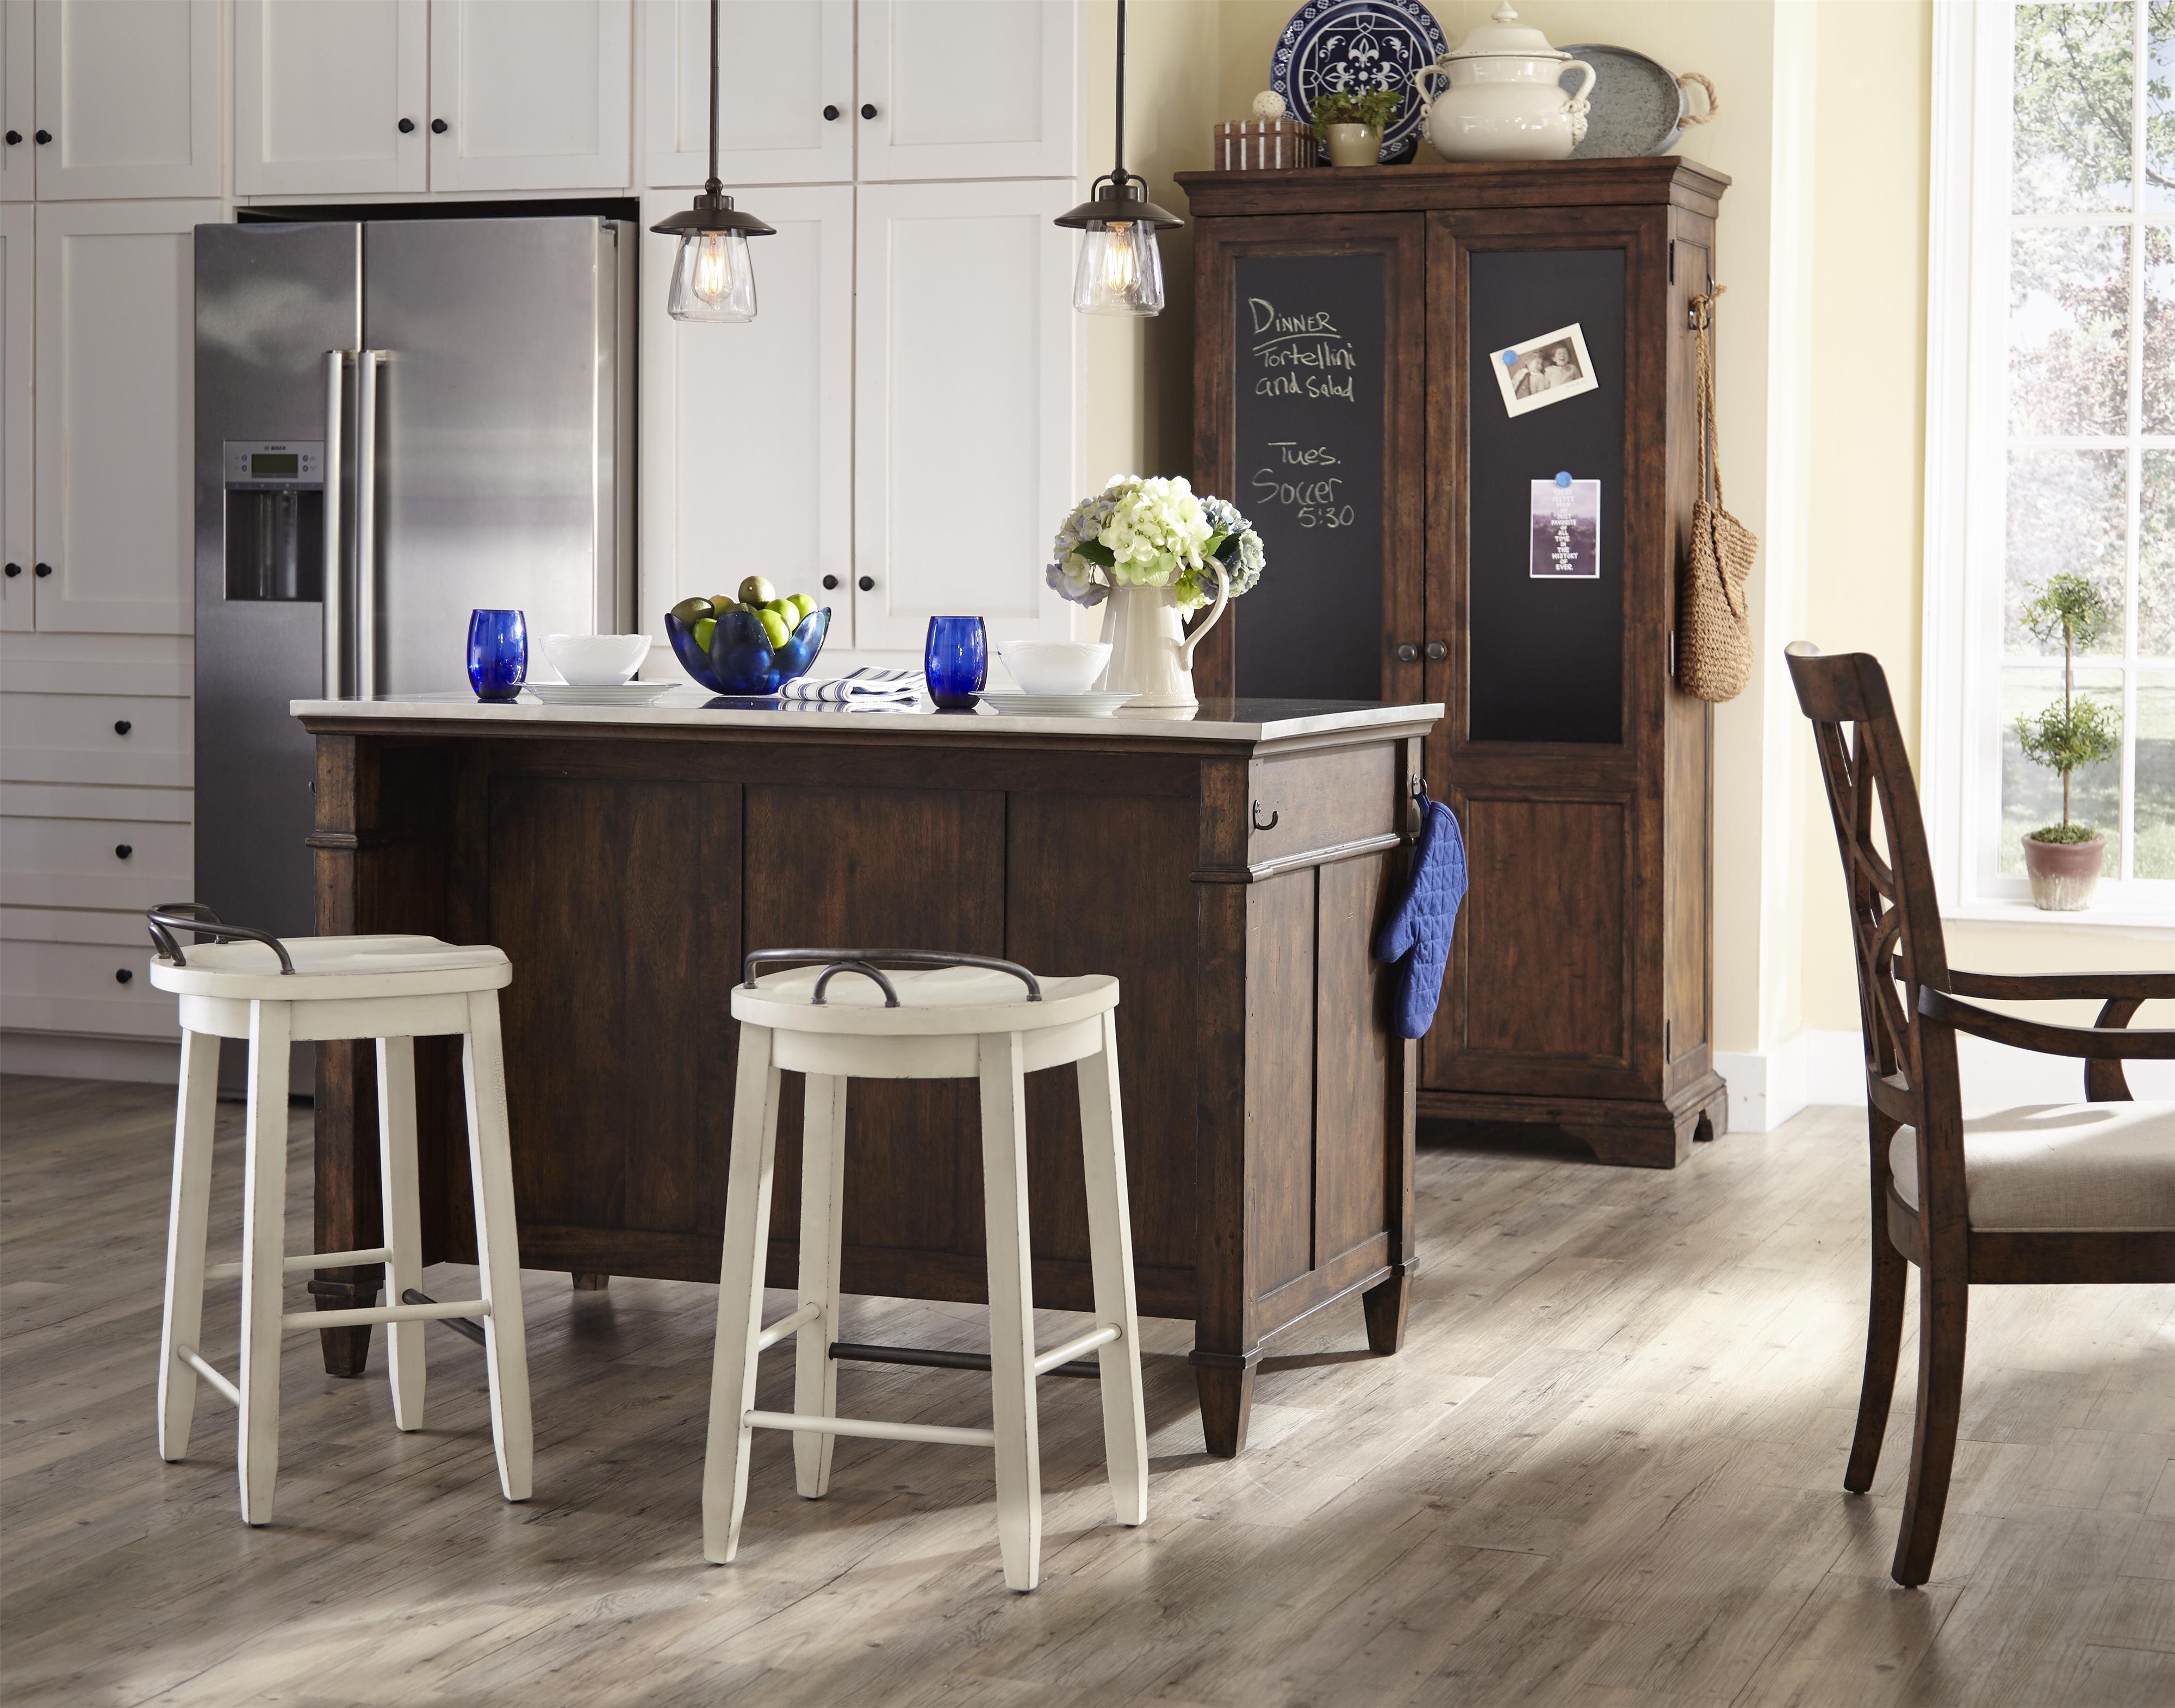 Trisha Yearwood Home Trisha Yearwood Home Kitchen Island With Towel Hooks Belfort Furniture